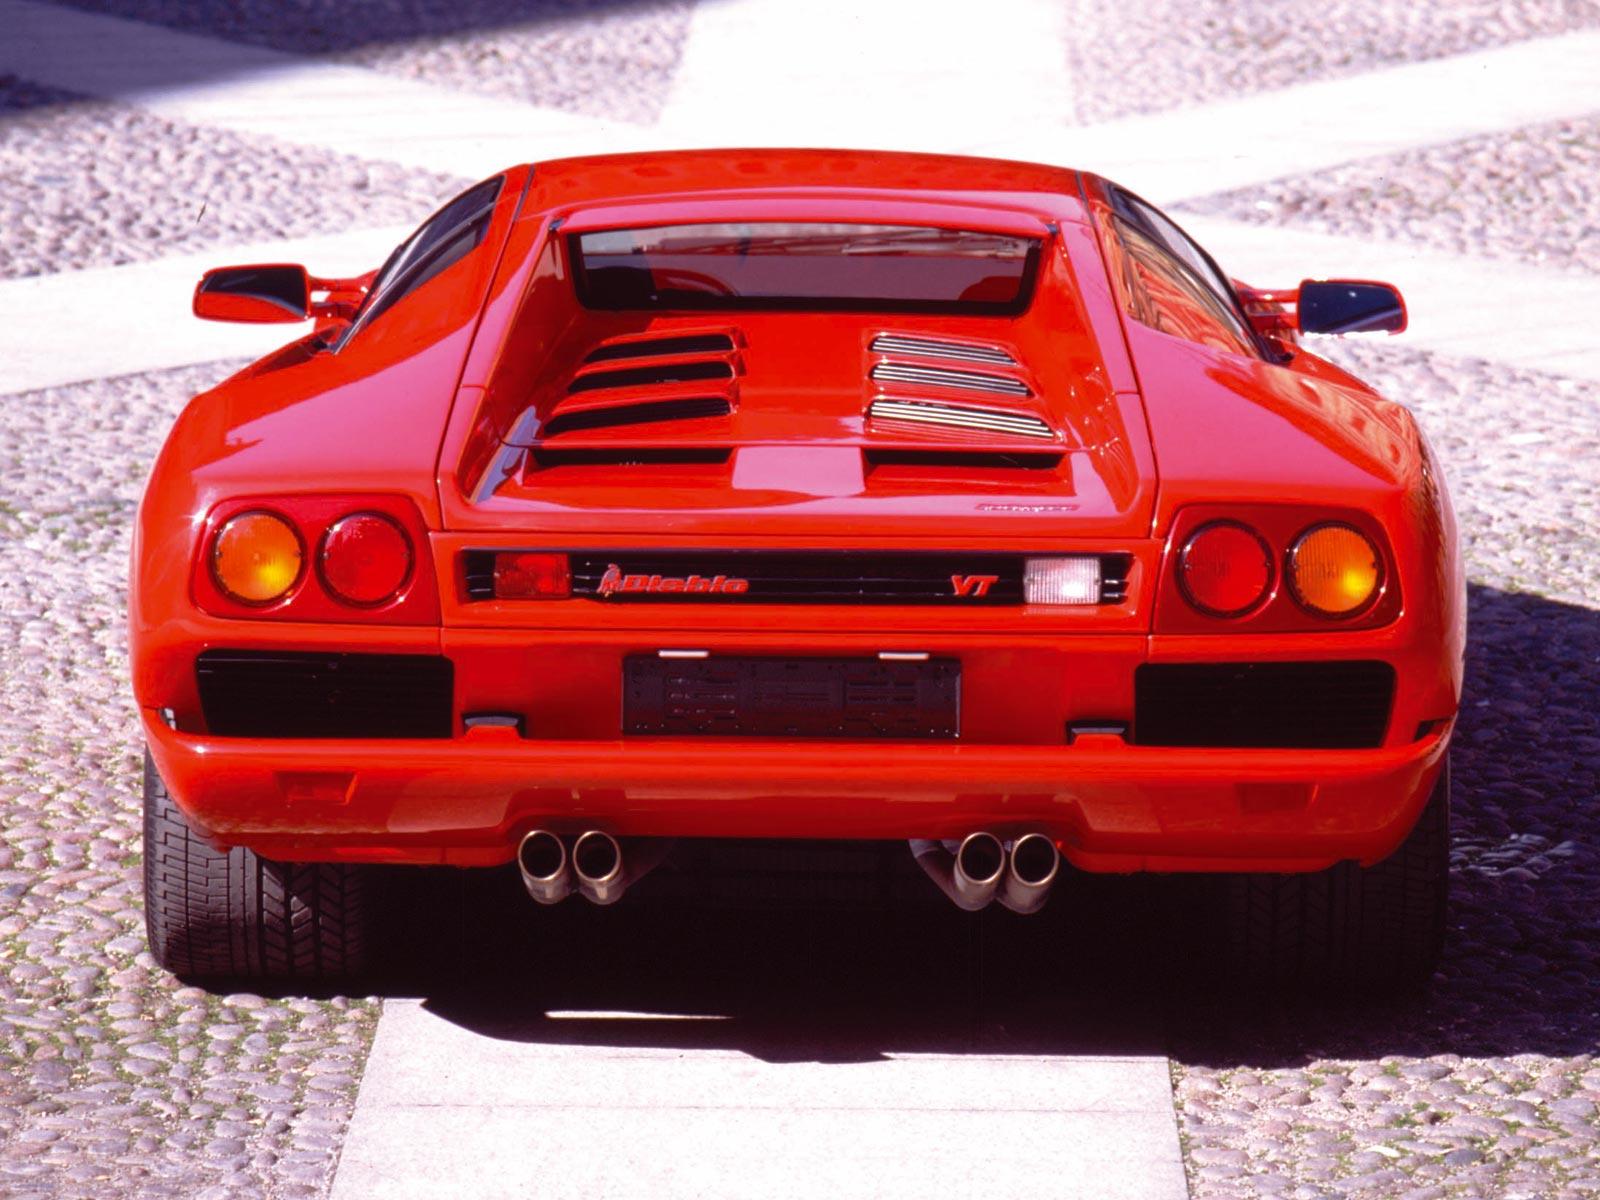 1990 2001 Lamborghini Diablo Autoguru Katalog At